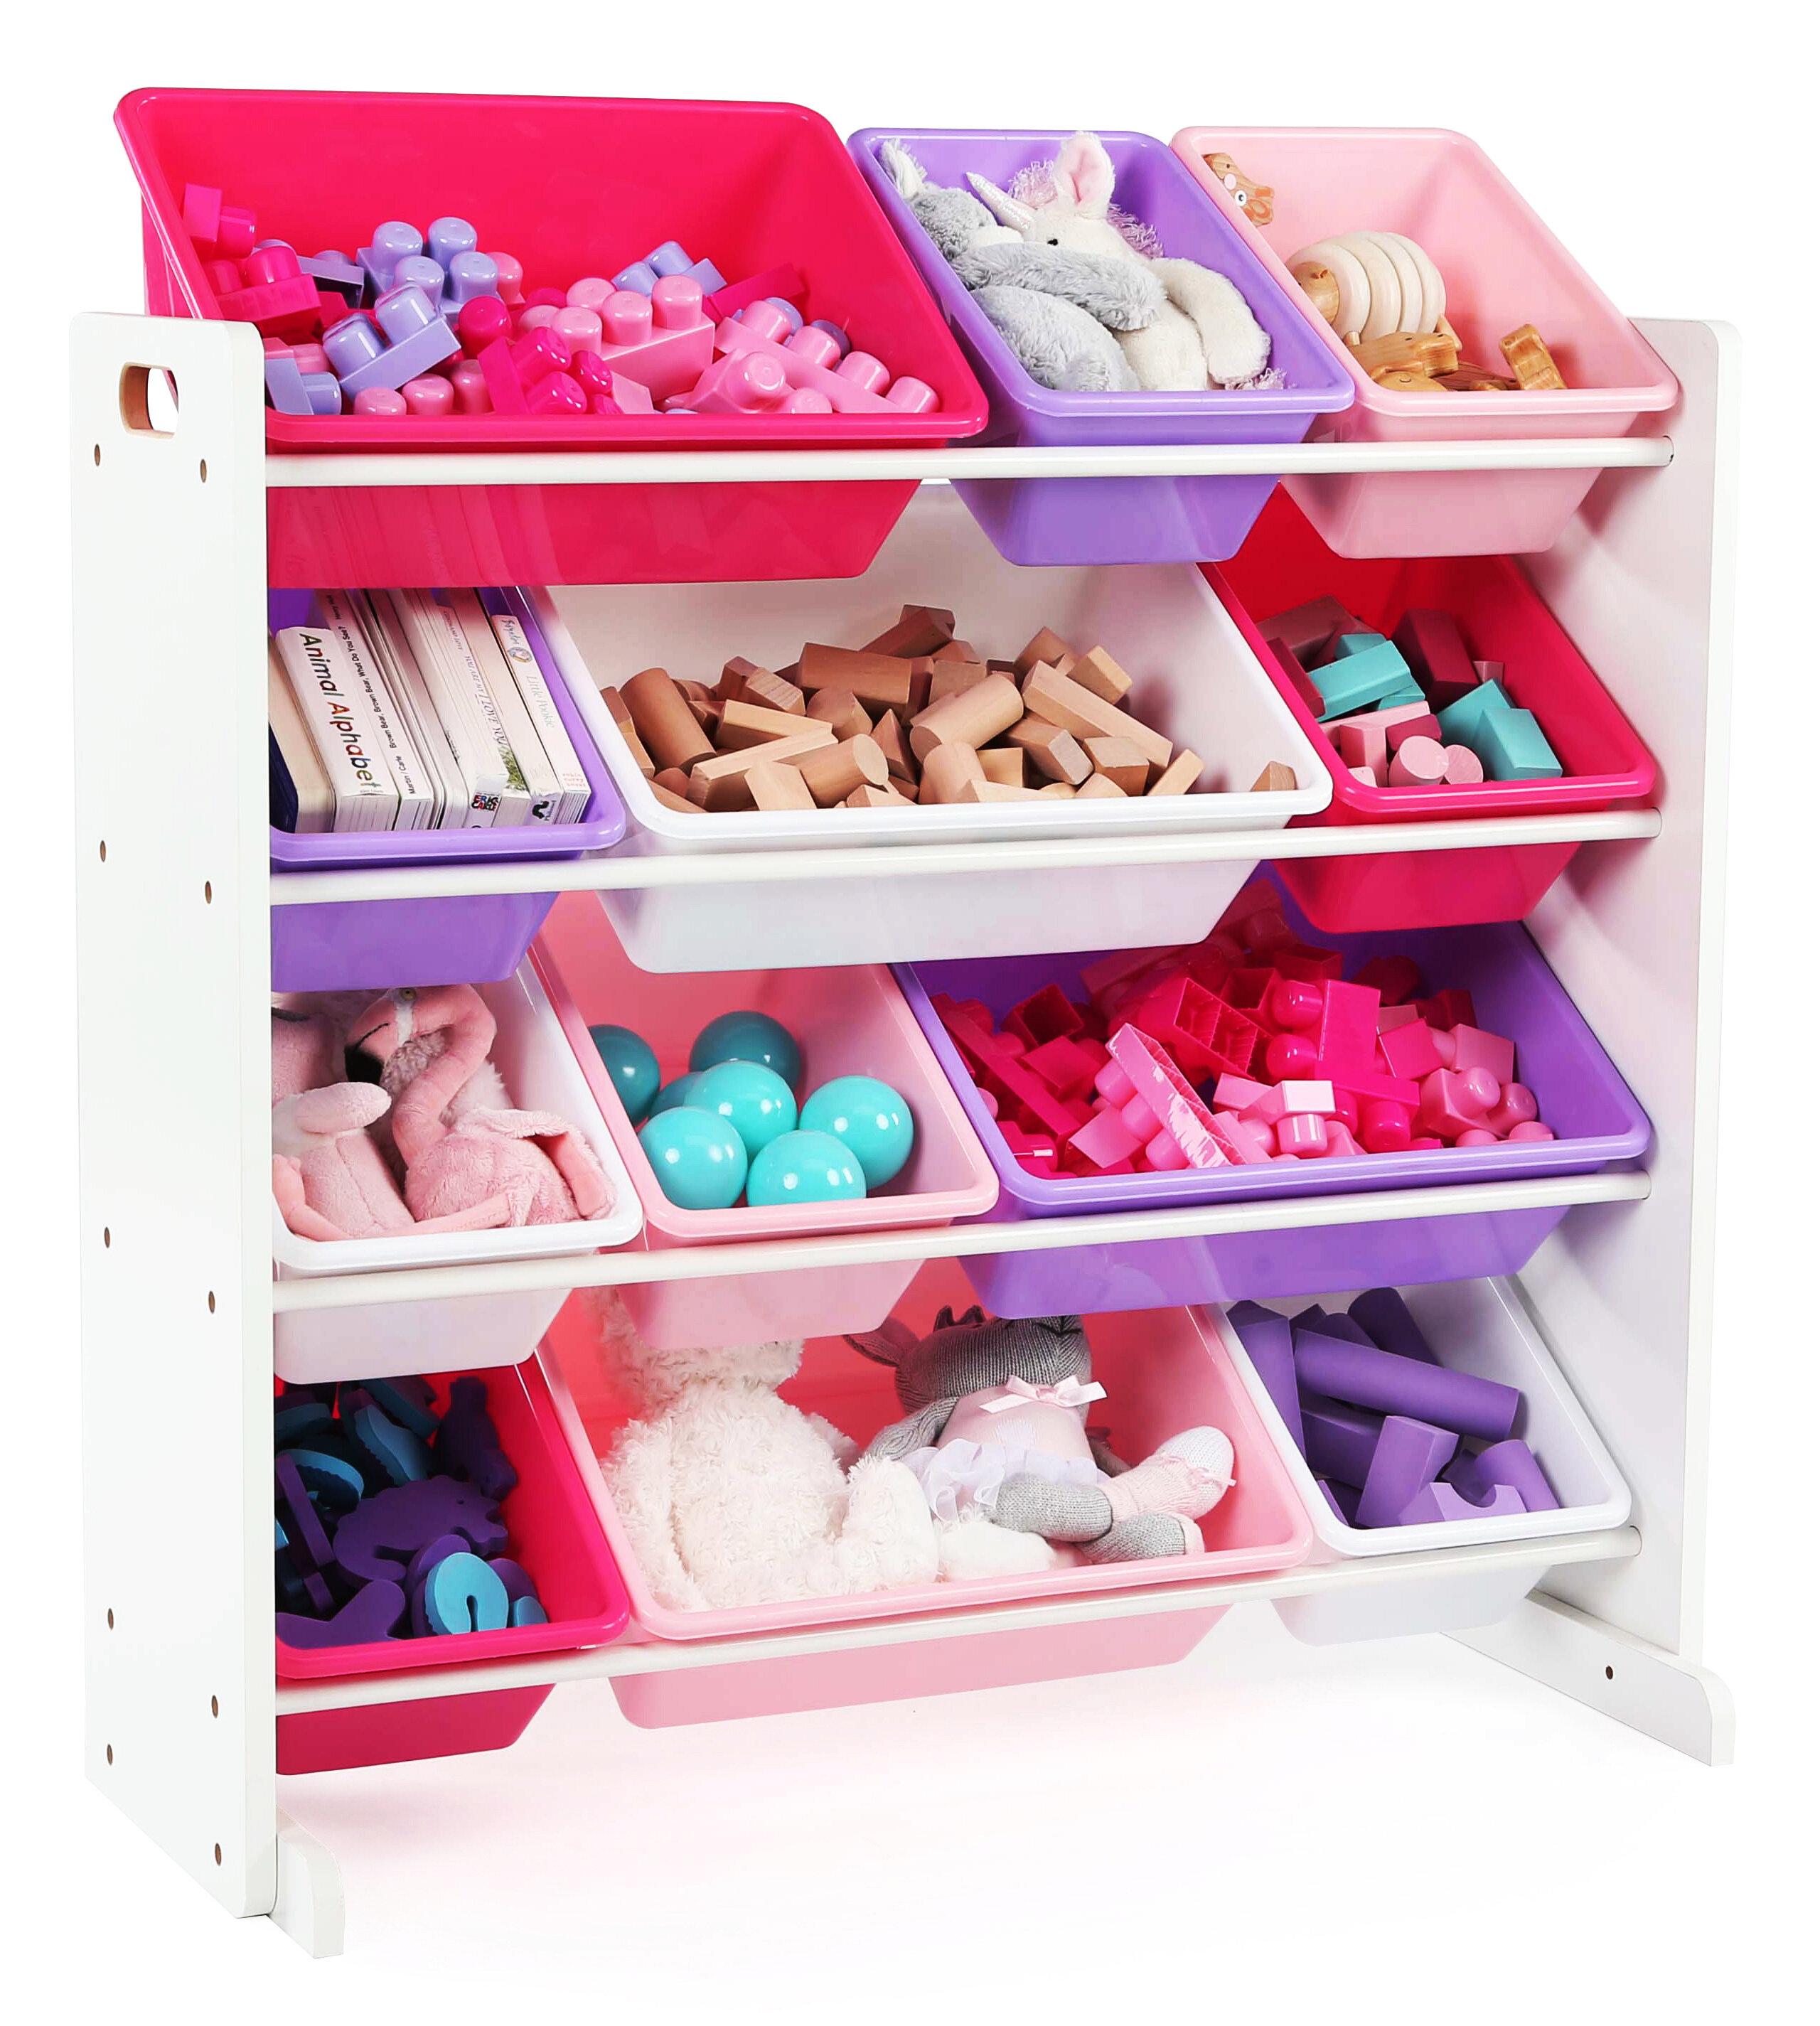 Zoomie Kids Neumann Kid Toy Storage Organizer Reviews Wayfair